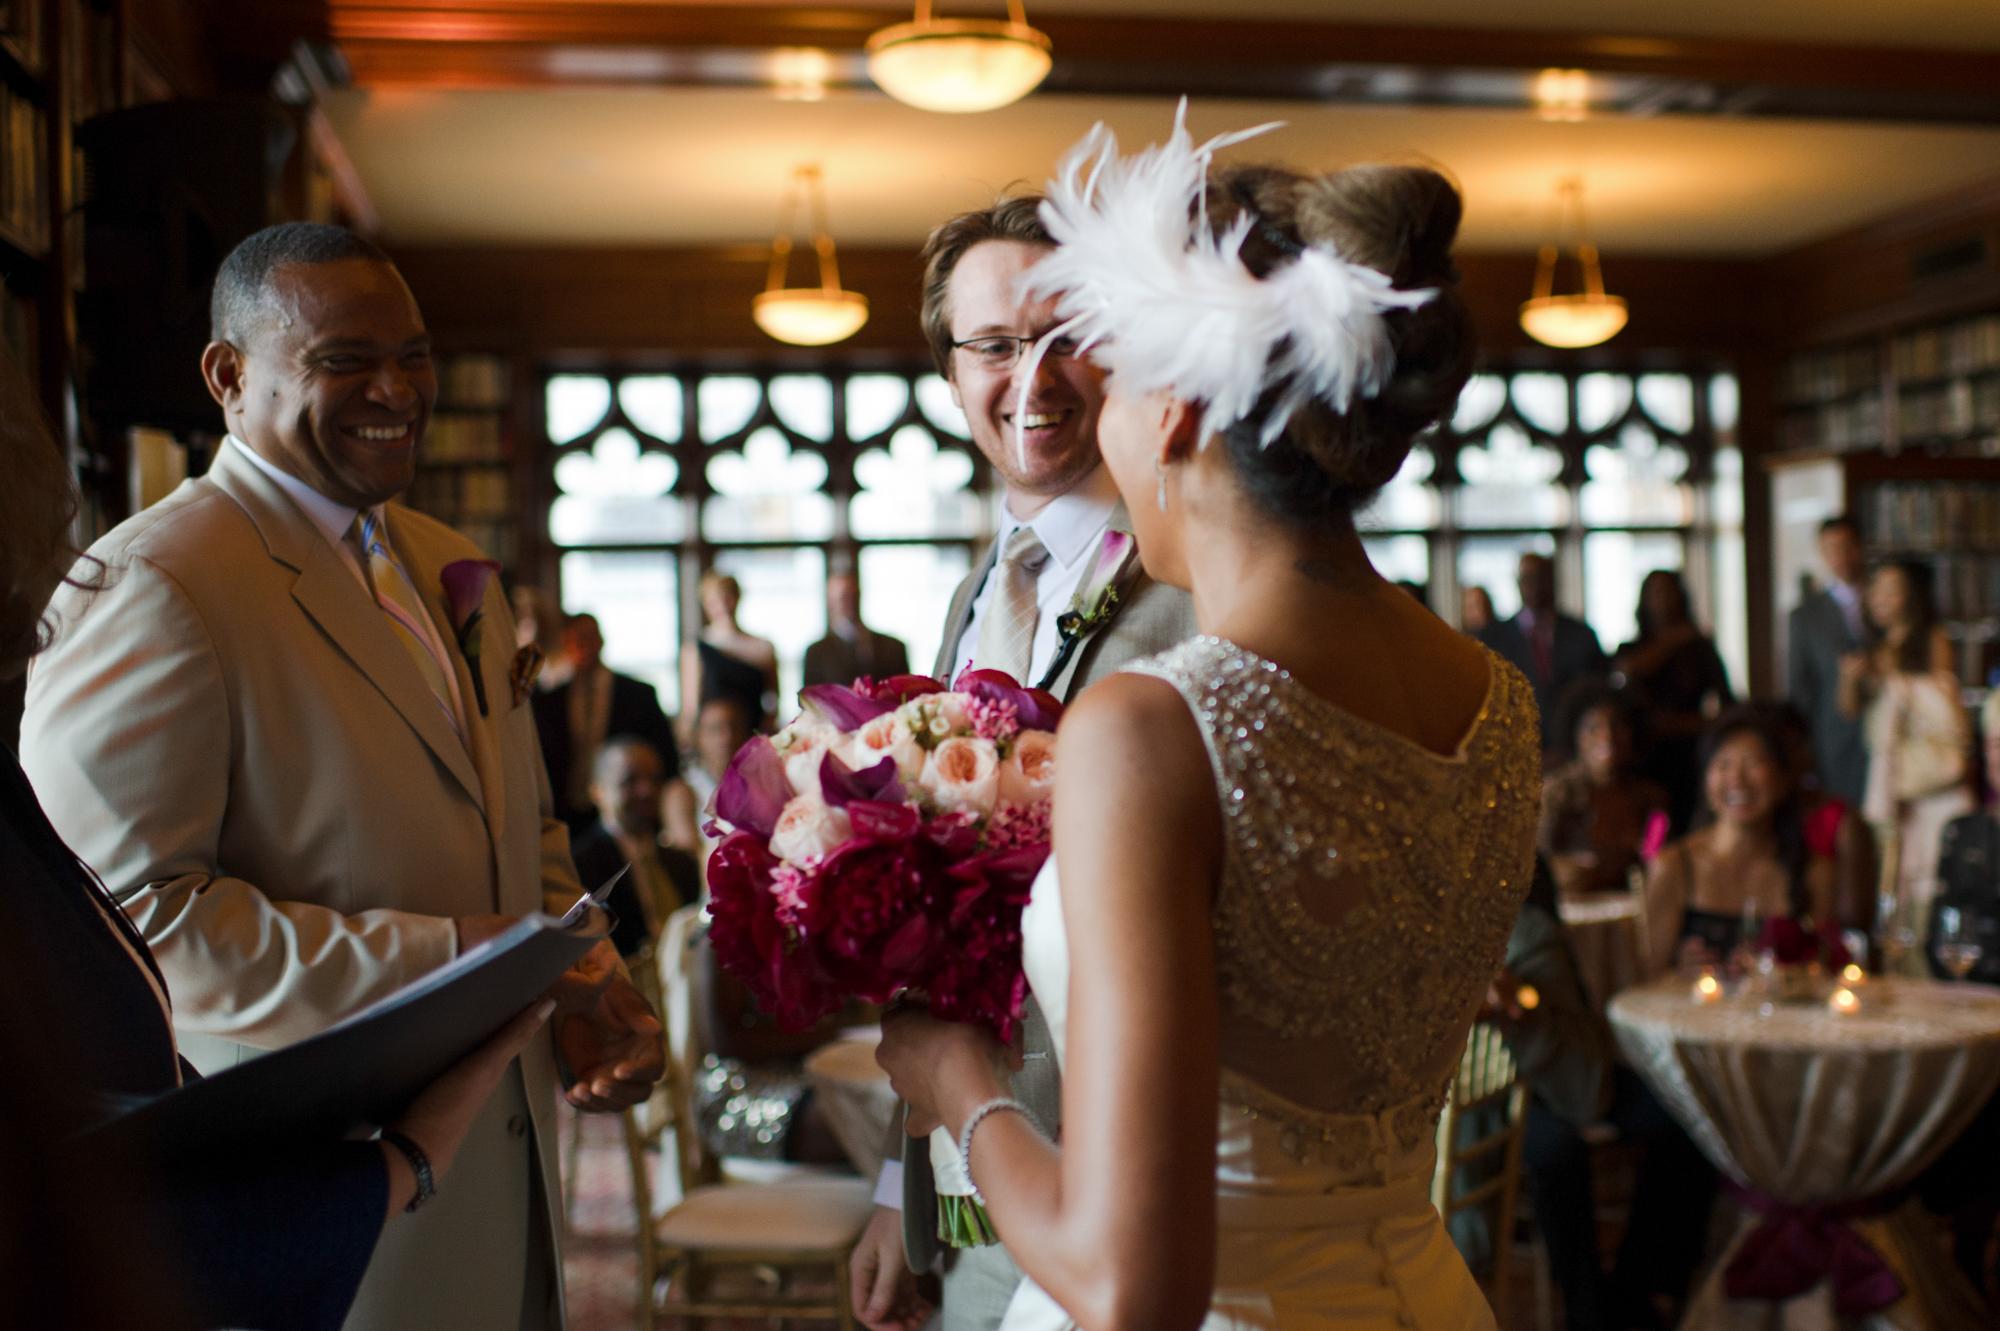 Wedding ceremony at University Club of Chicago